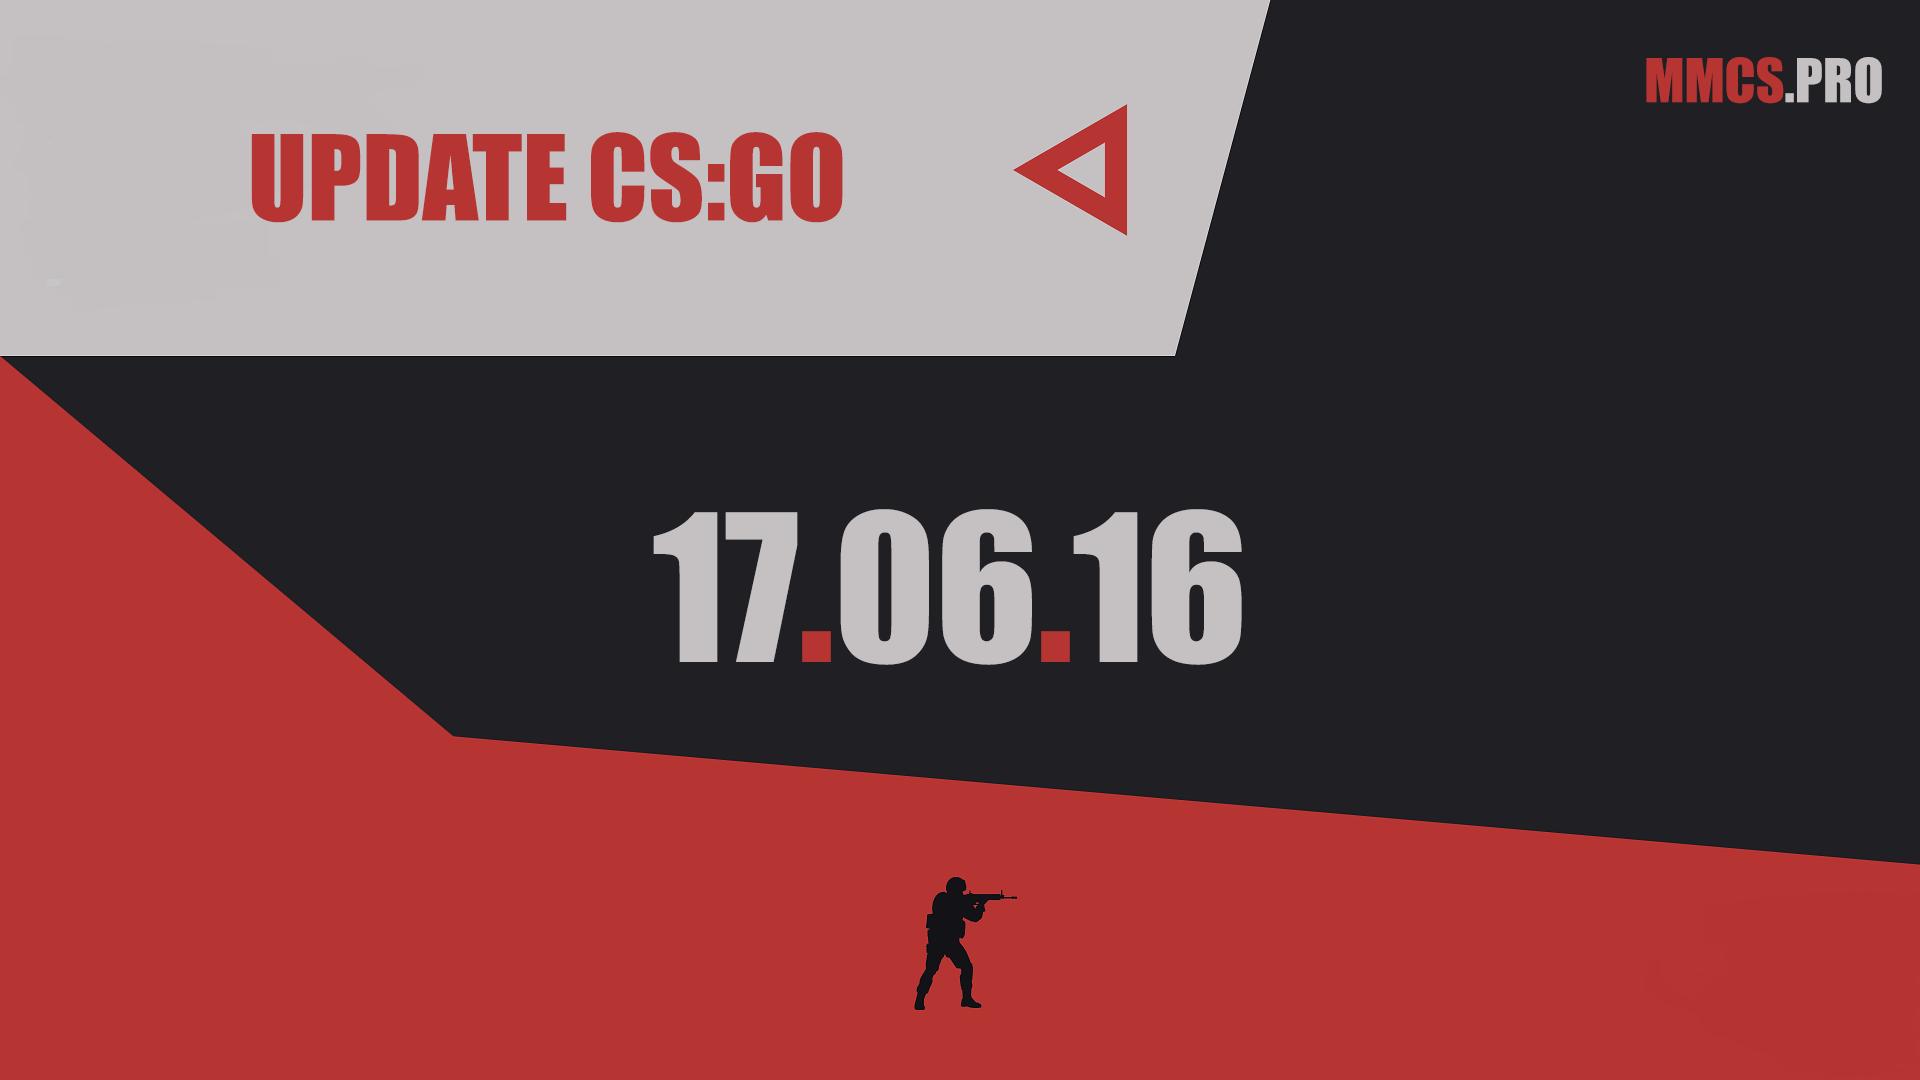 https://mmcs.pro/update-csgo-17-06-2016-valve/